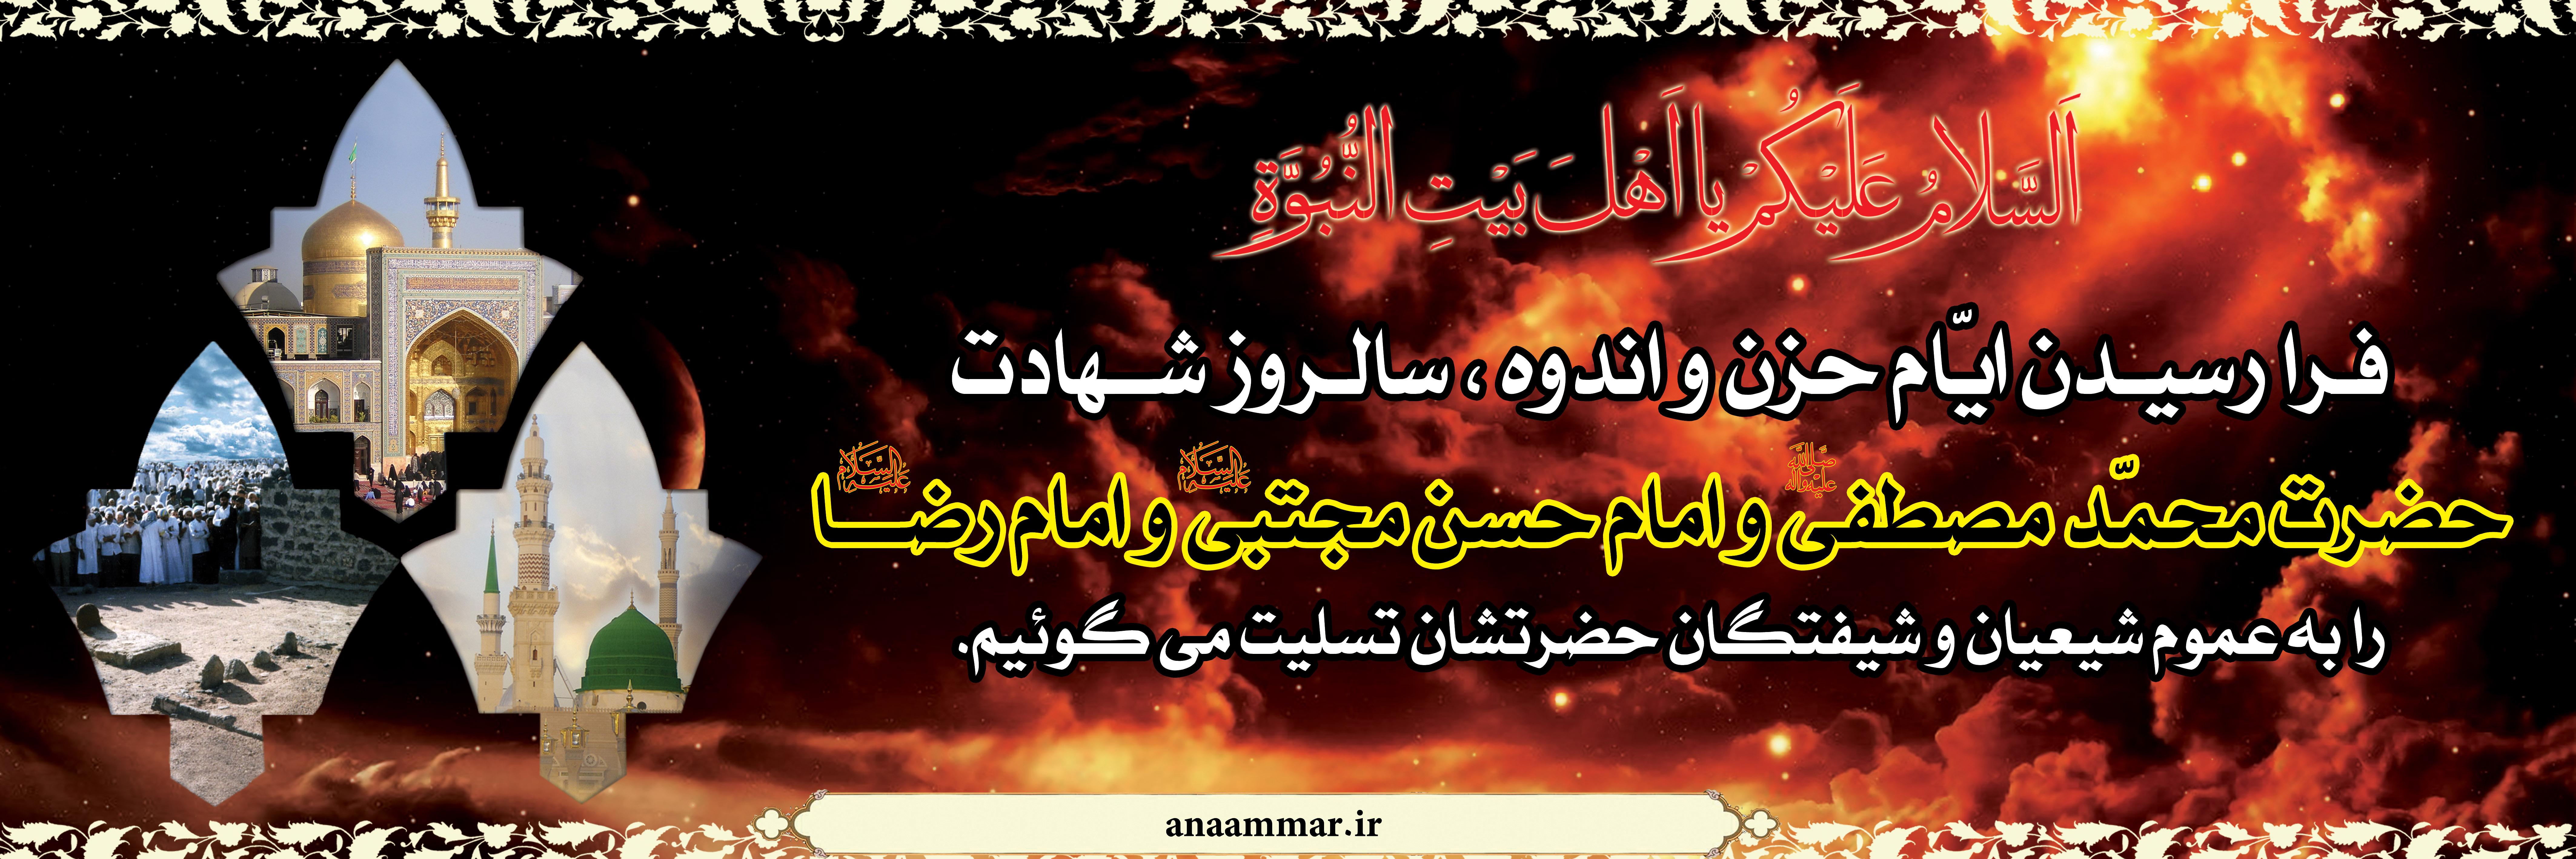 http://s1.picofile.com/file/8227418334/bisto_hashte_safar_94_1.jpg